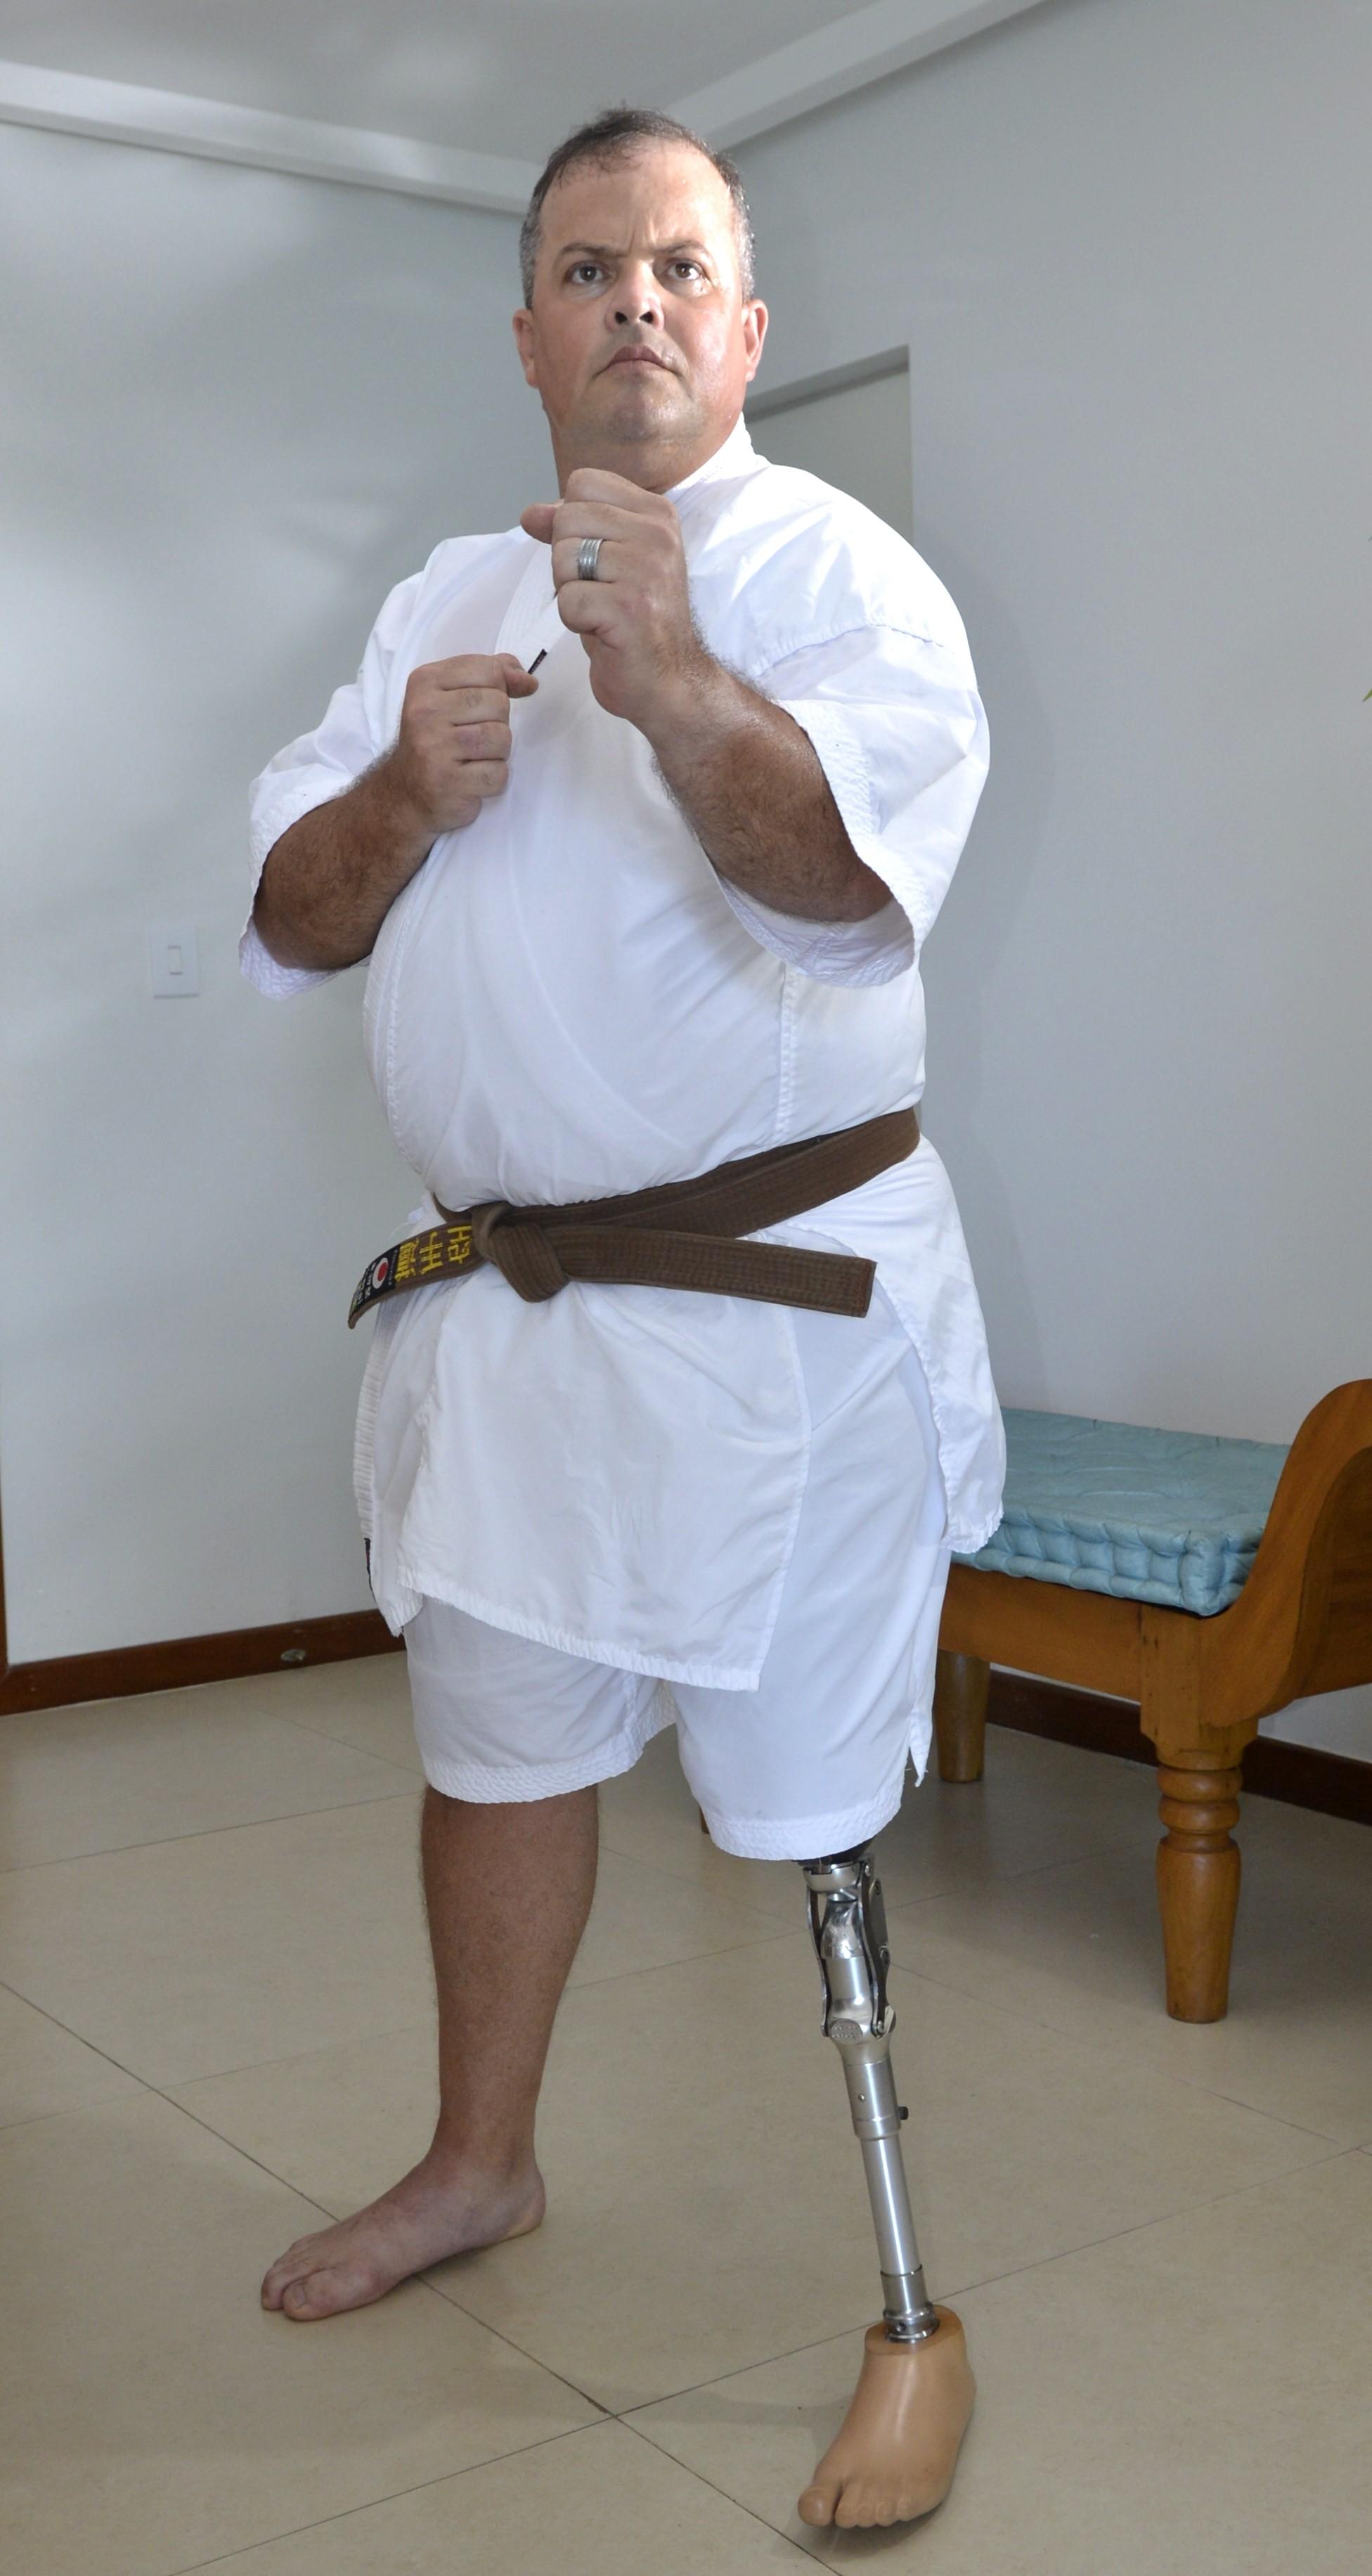 Sargente pede prótese para lutar karatê (Foto: Carlos Alberto Silva/ A Gazeta)